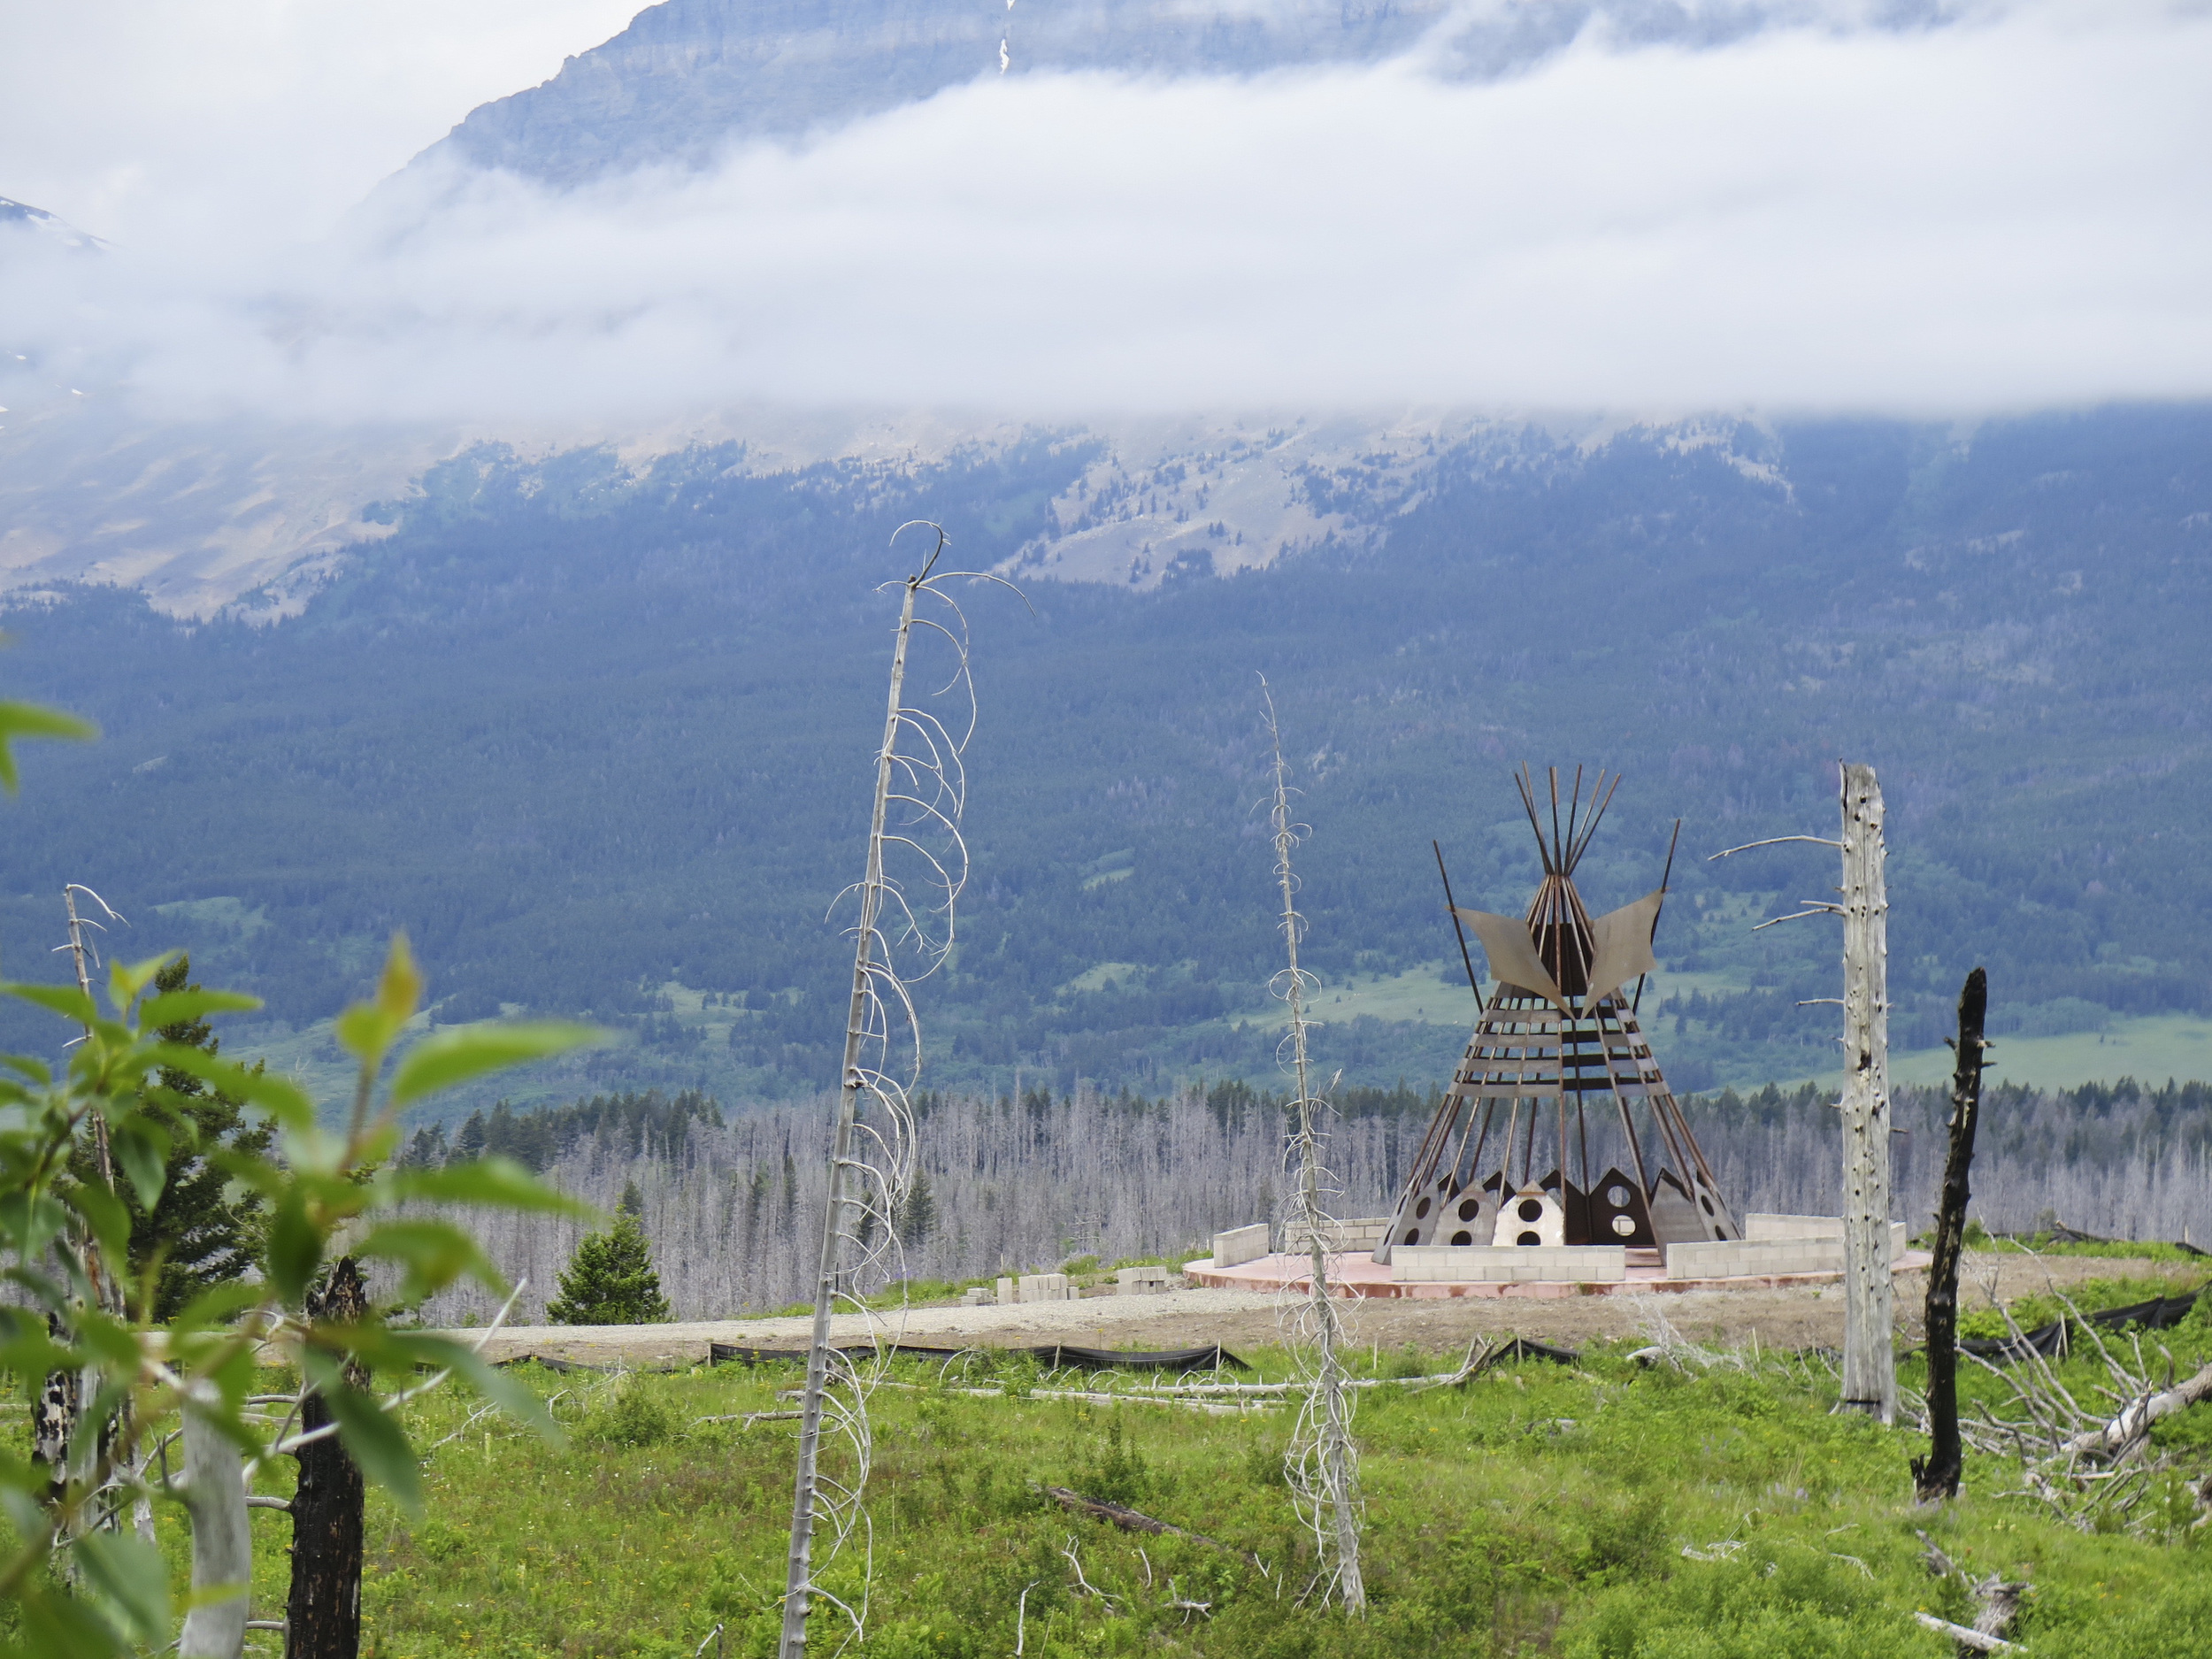 Blackfoot territory